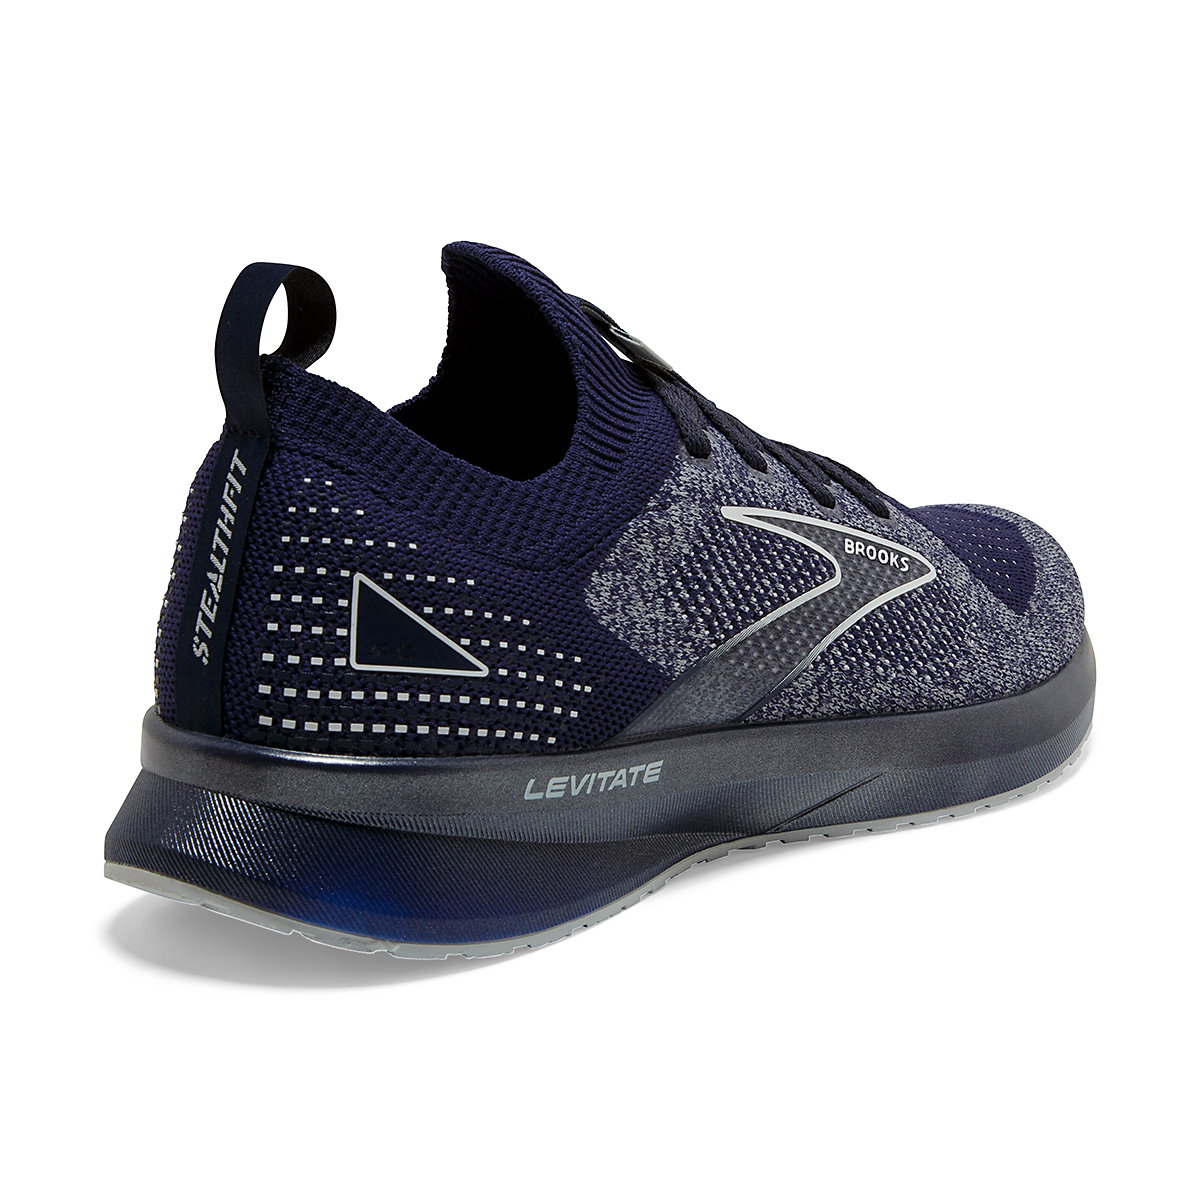 Men's Brooks Levitate Stealthfit 5 Running Shoe - Color: Peacoat/Grey - Size: 7 - Width: Regular, Peacoat/Grey, large, image 3